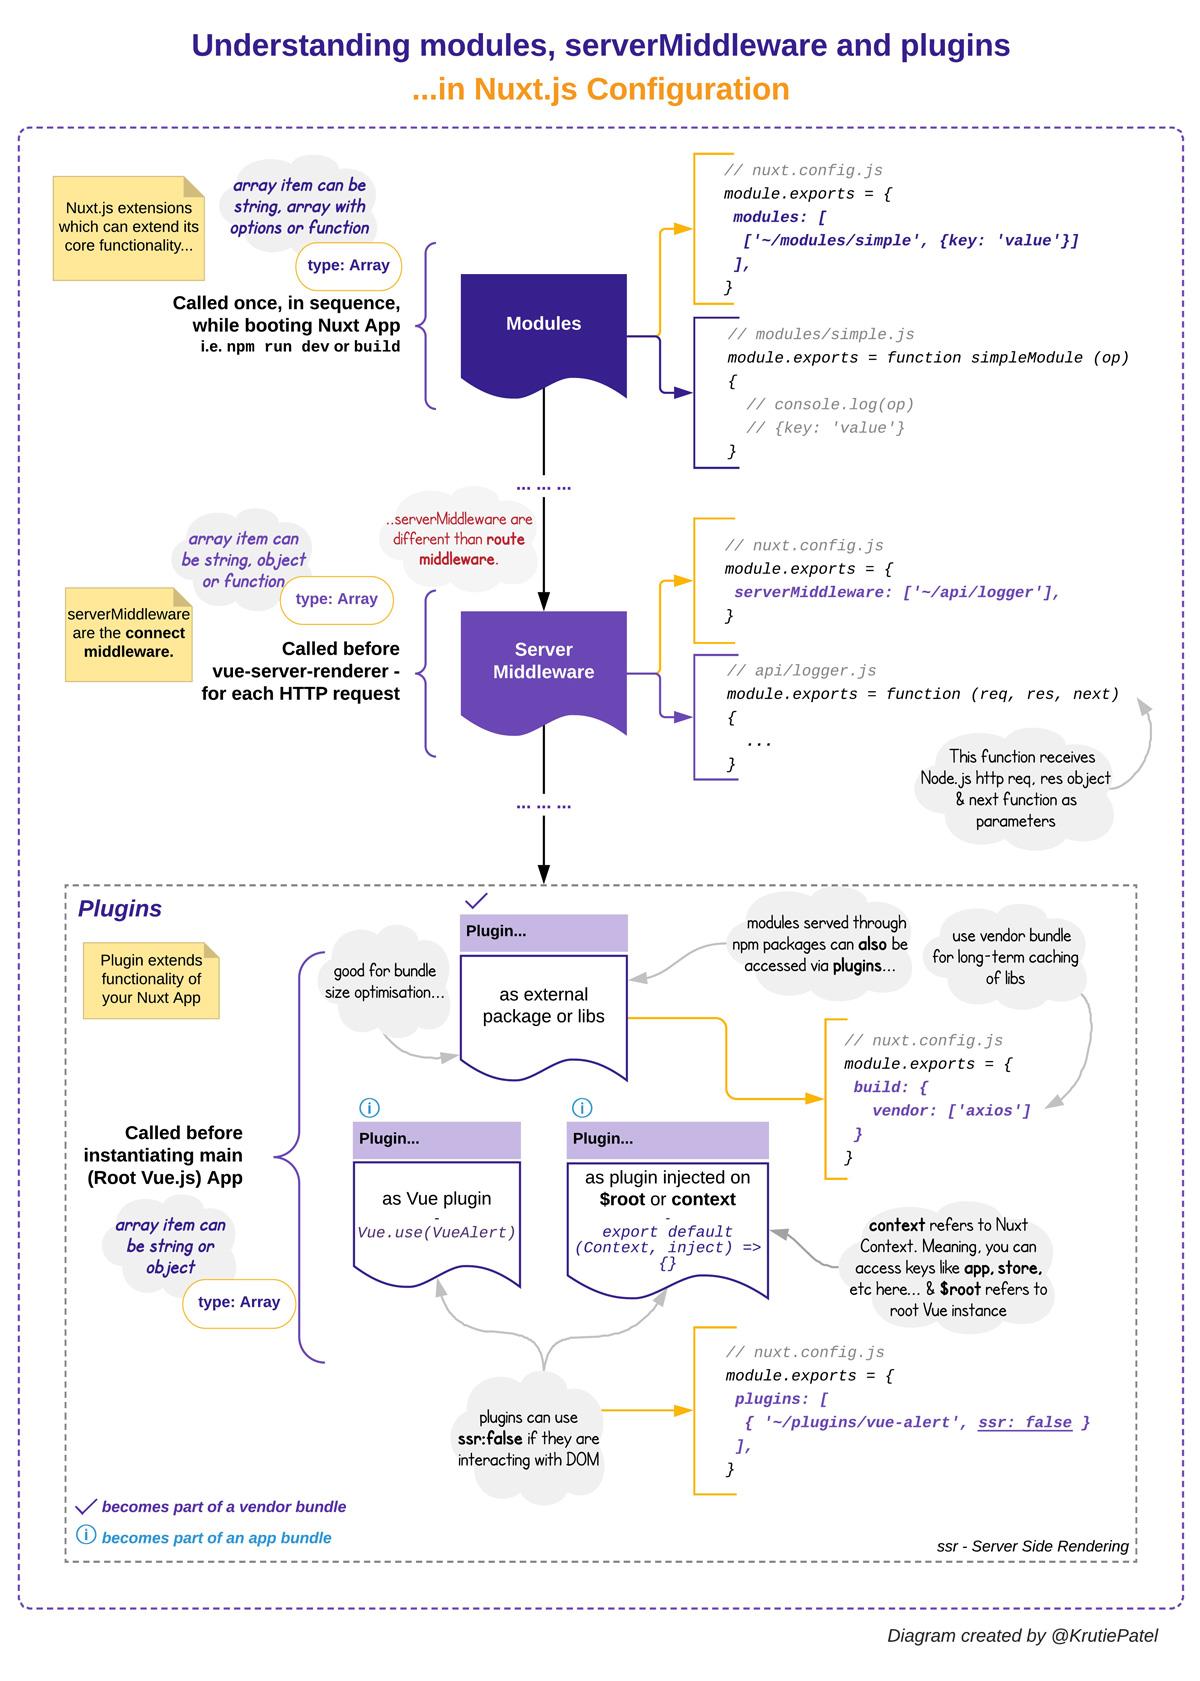 modules-servermiddleware-plugins-in-nuxt-js